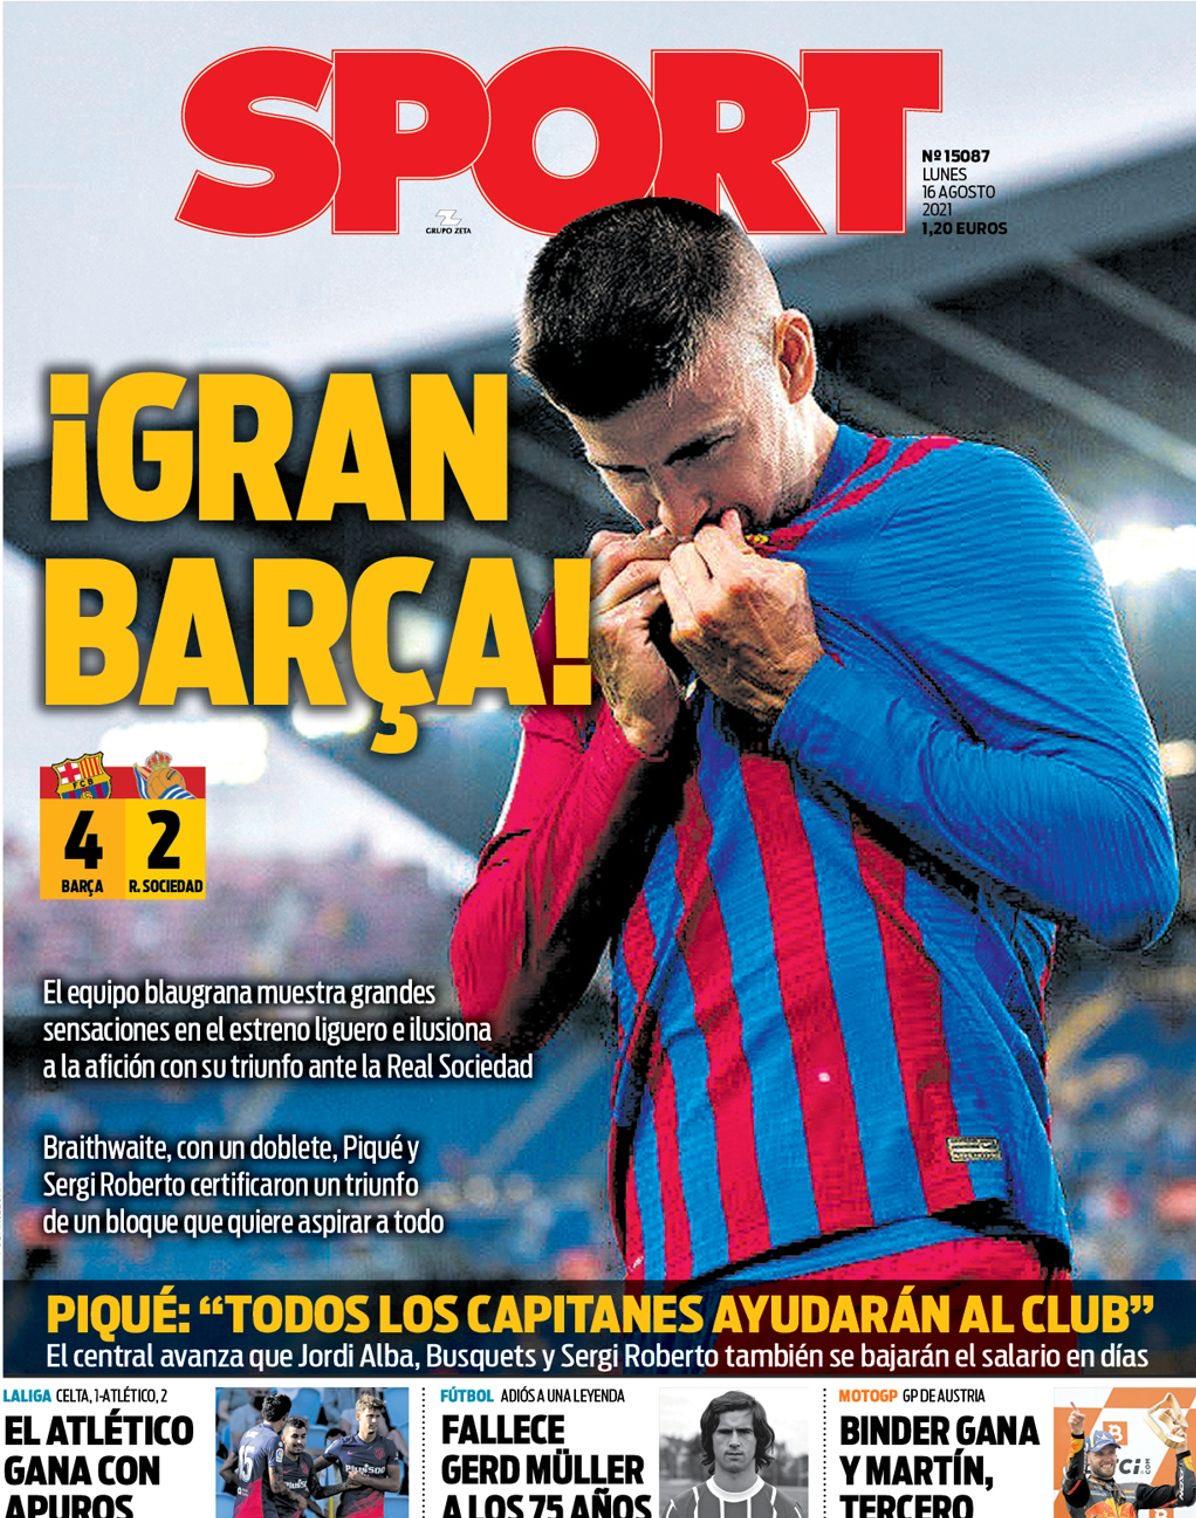 واکنش جالب مطبوعات اسپانیا به برد بارسلونا بدون مسی / تصاویر